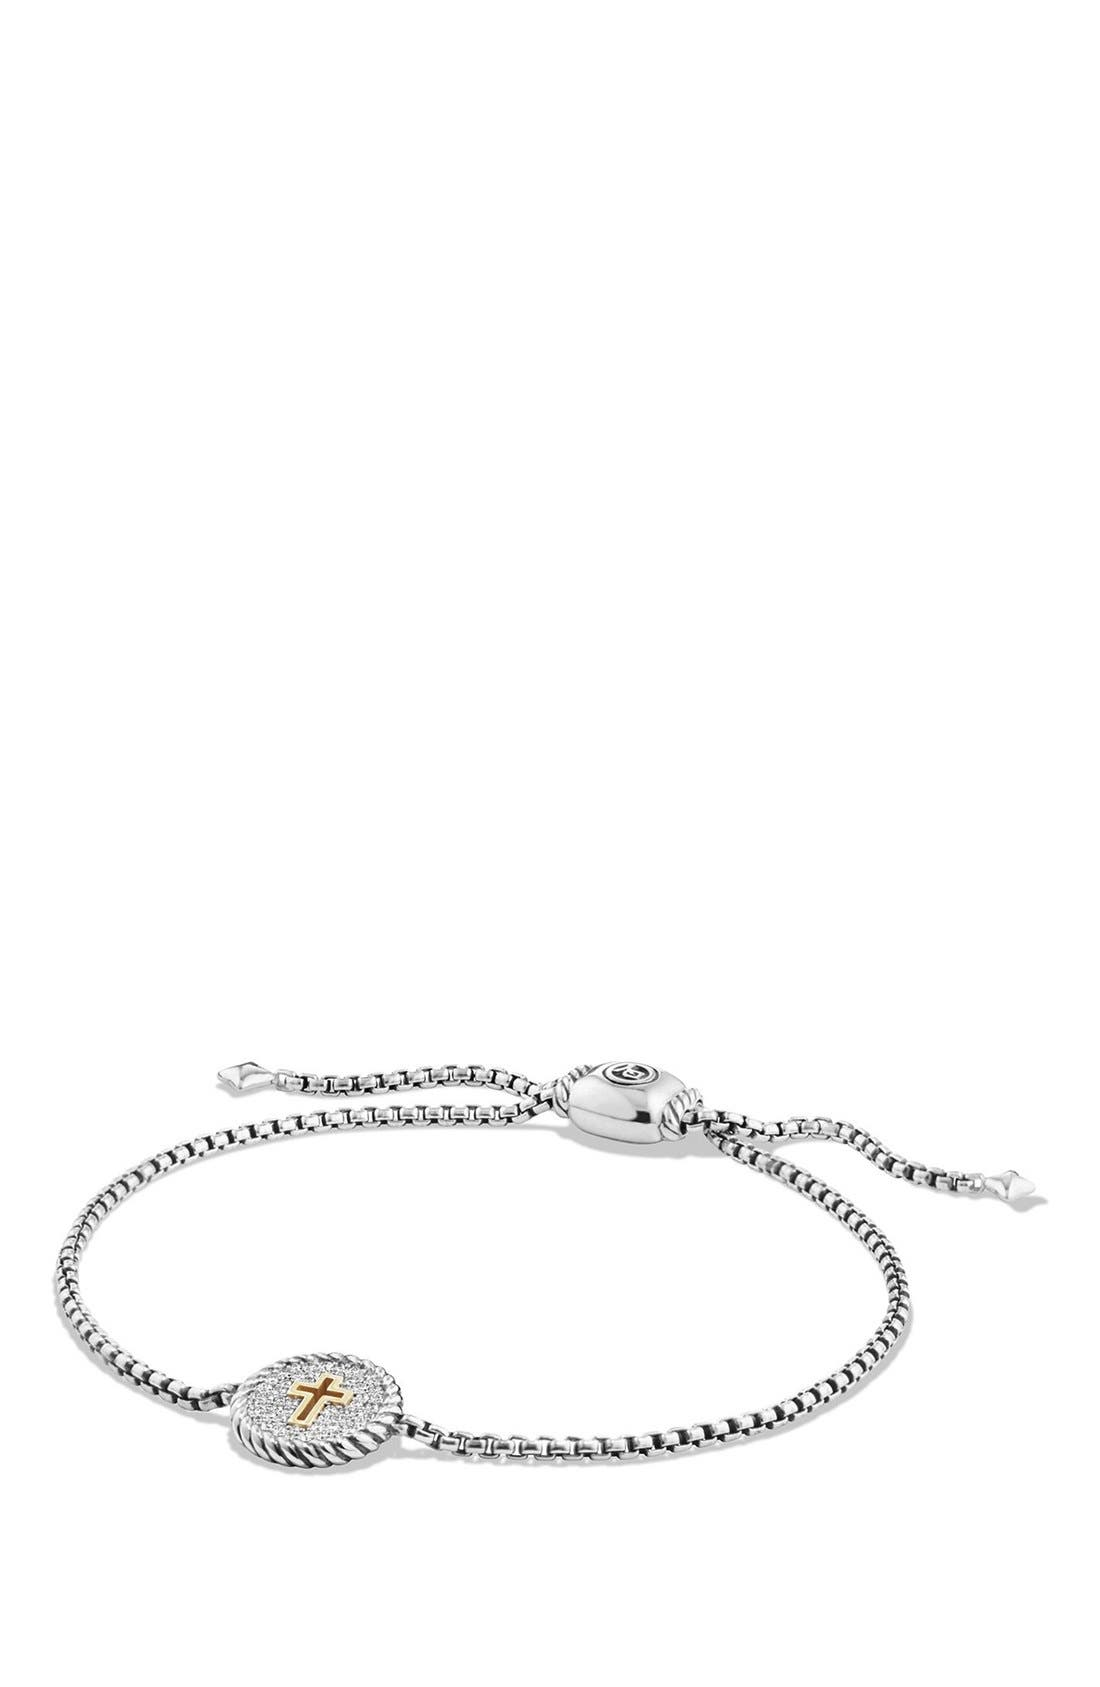 DAVID YURMAN Cable Collectibles Cross Charm Bracelet with Diamonds